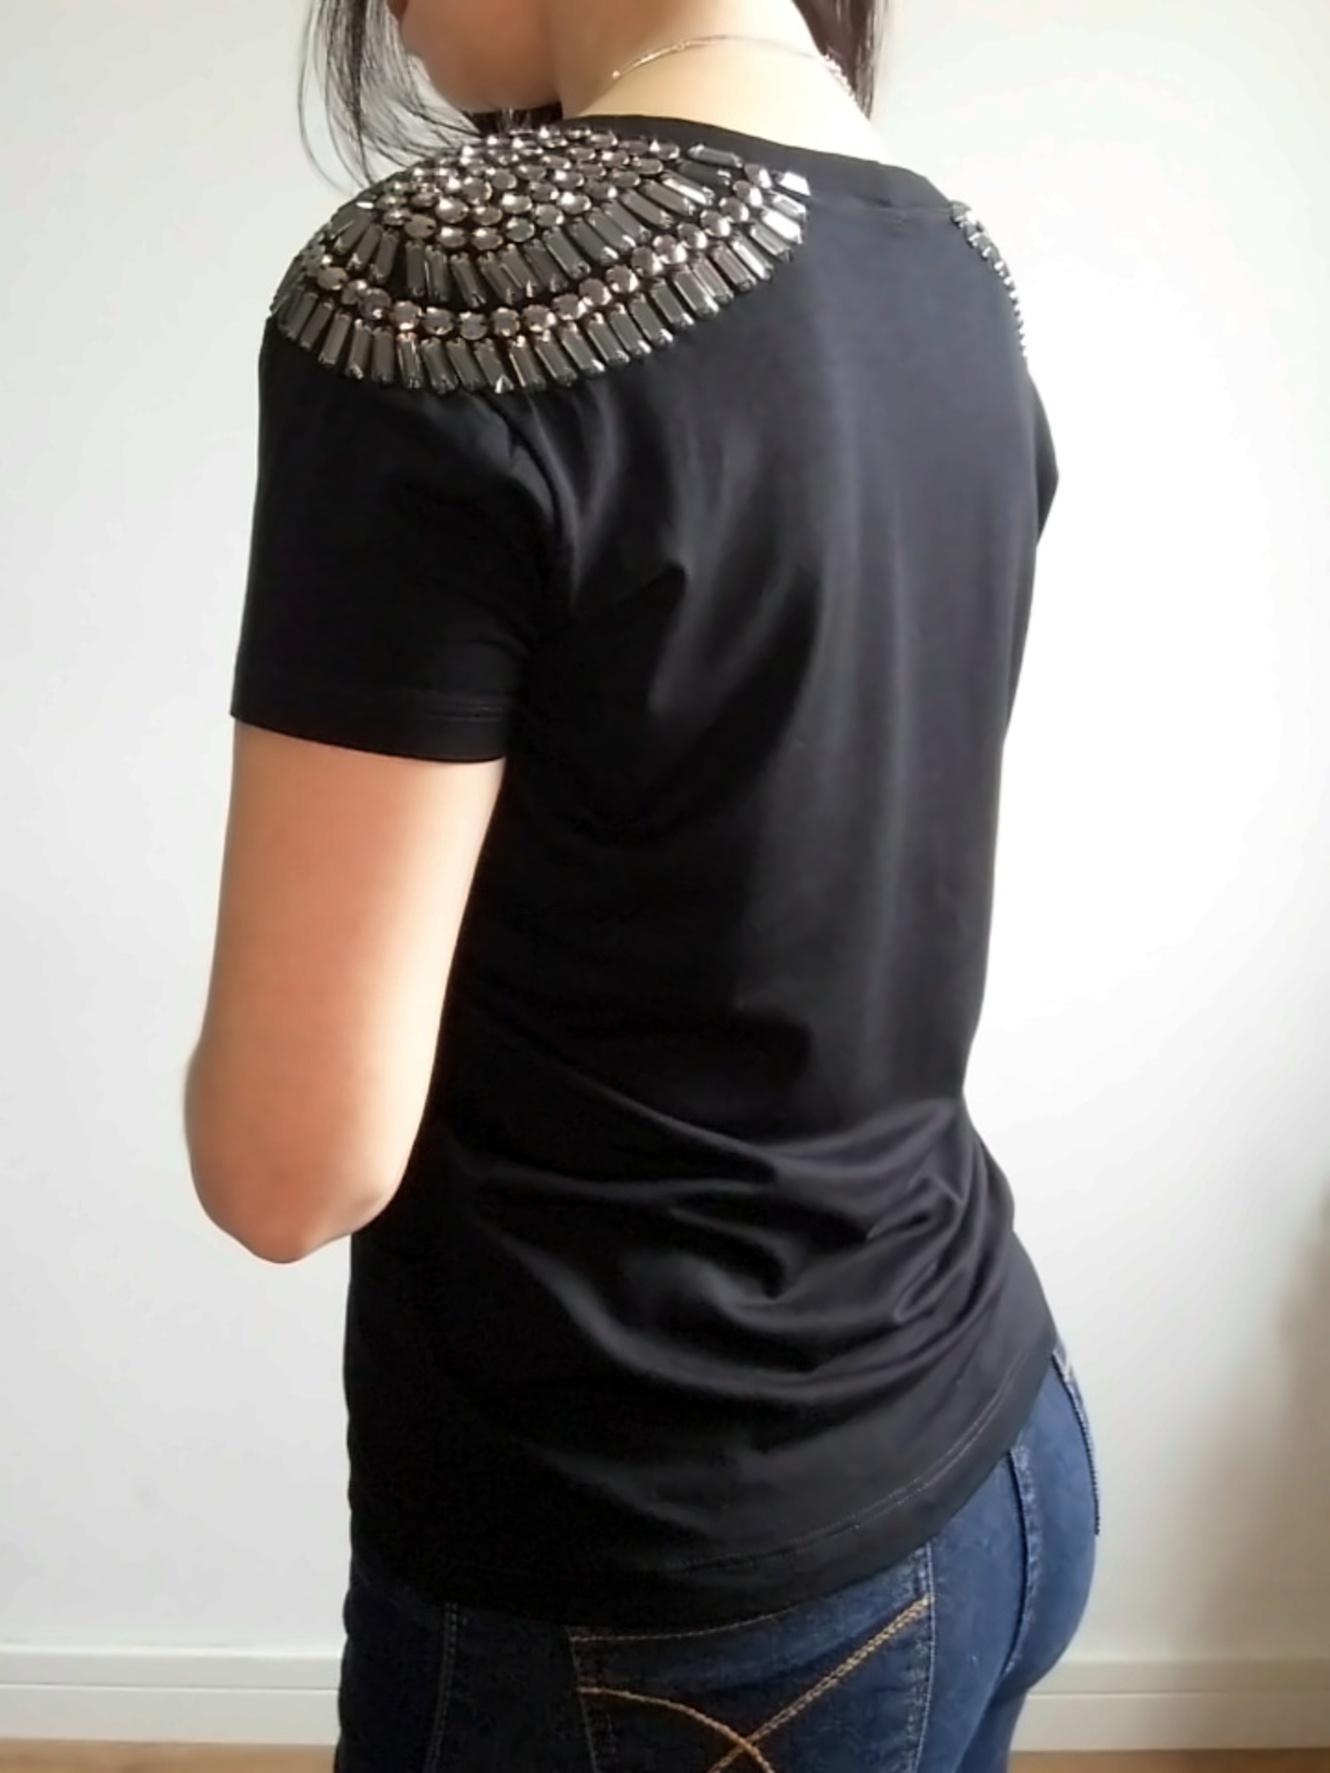 Camiseta preta bordada